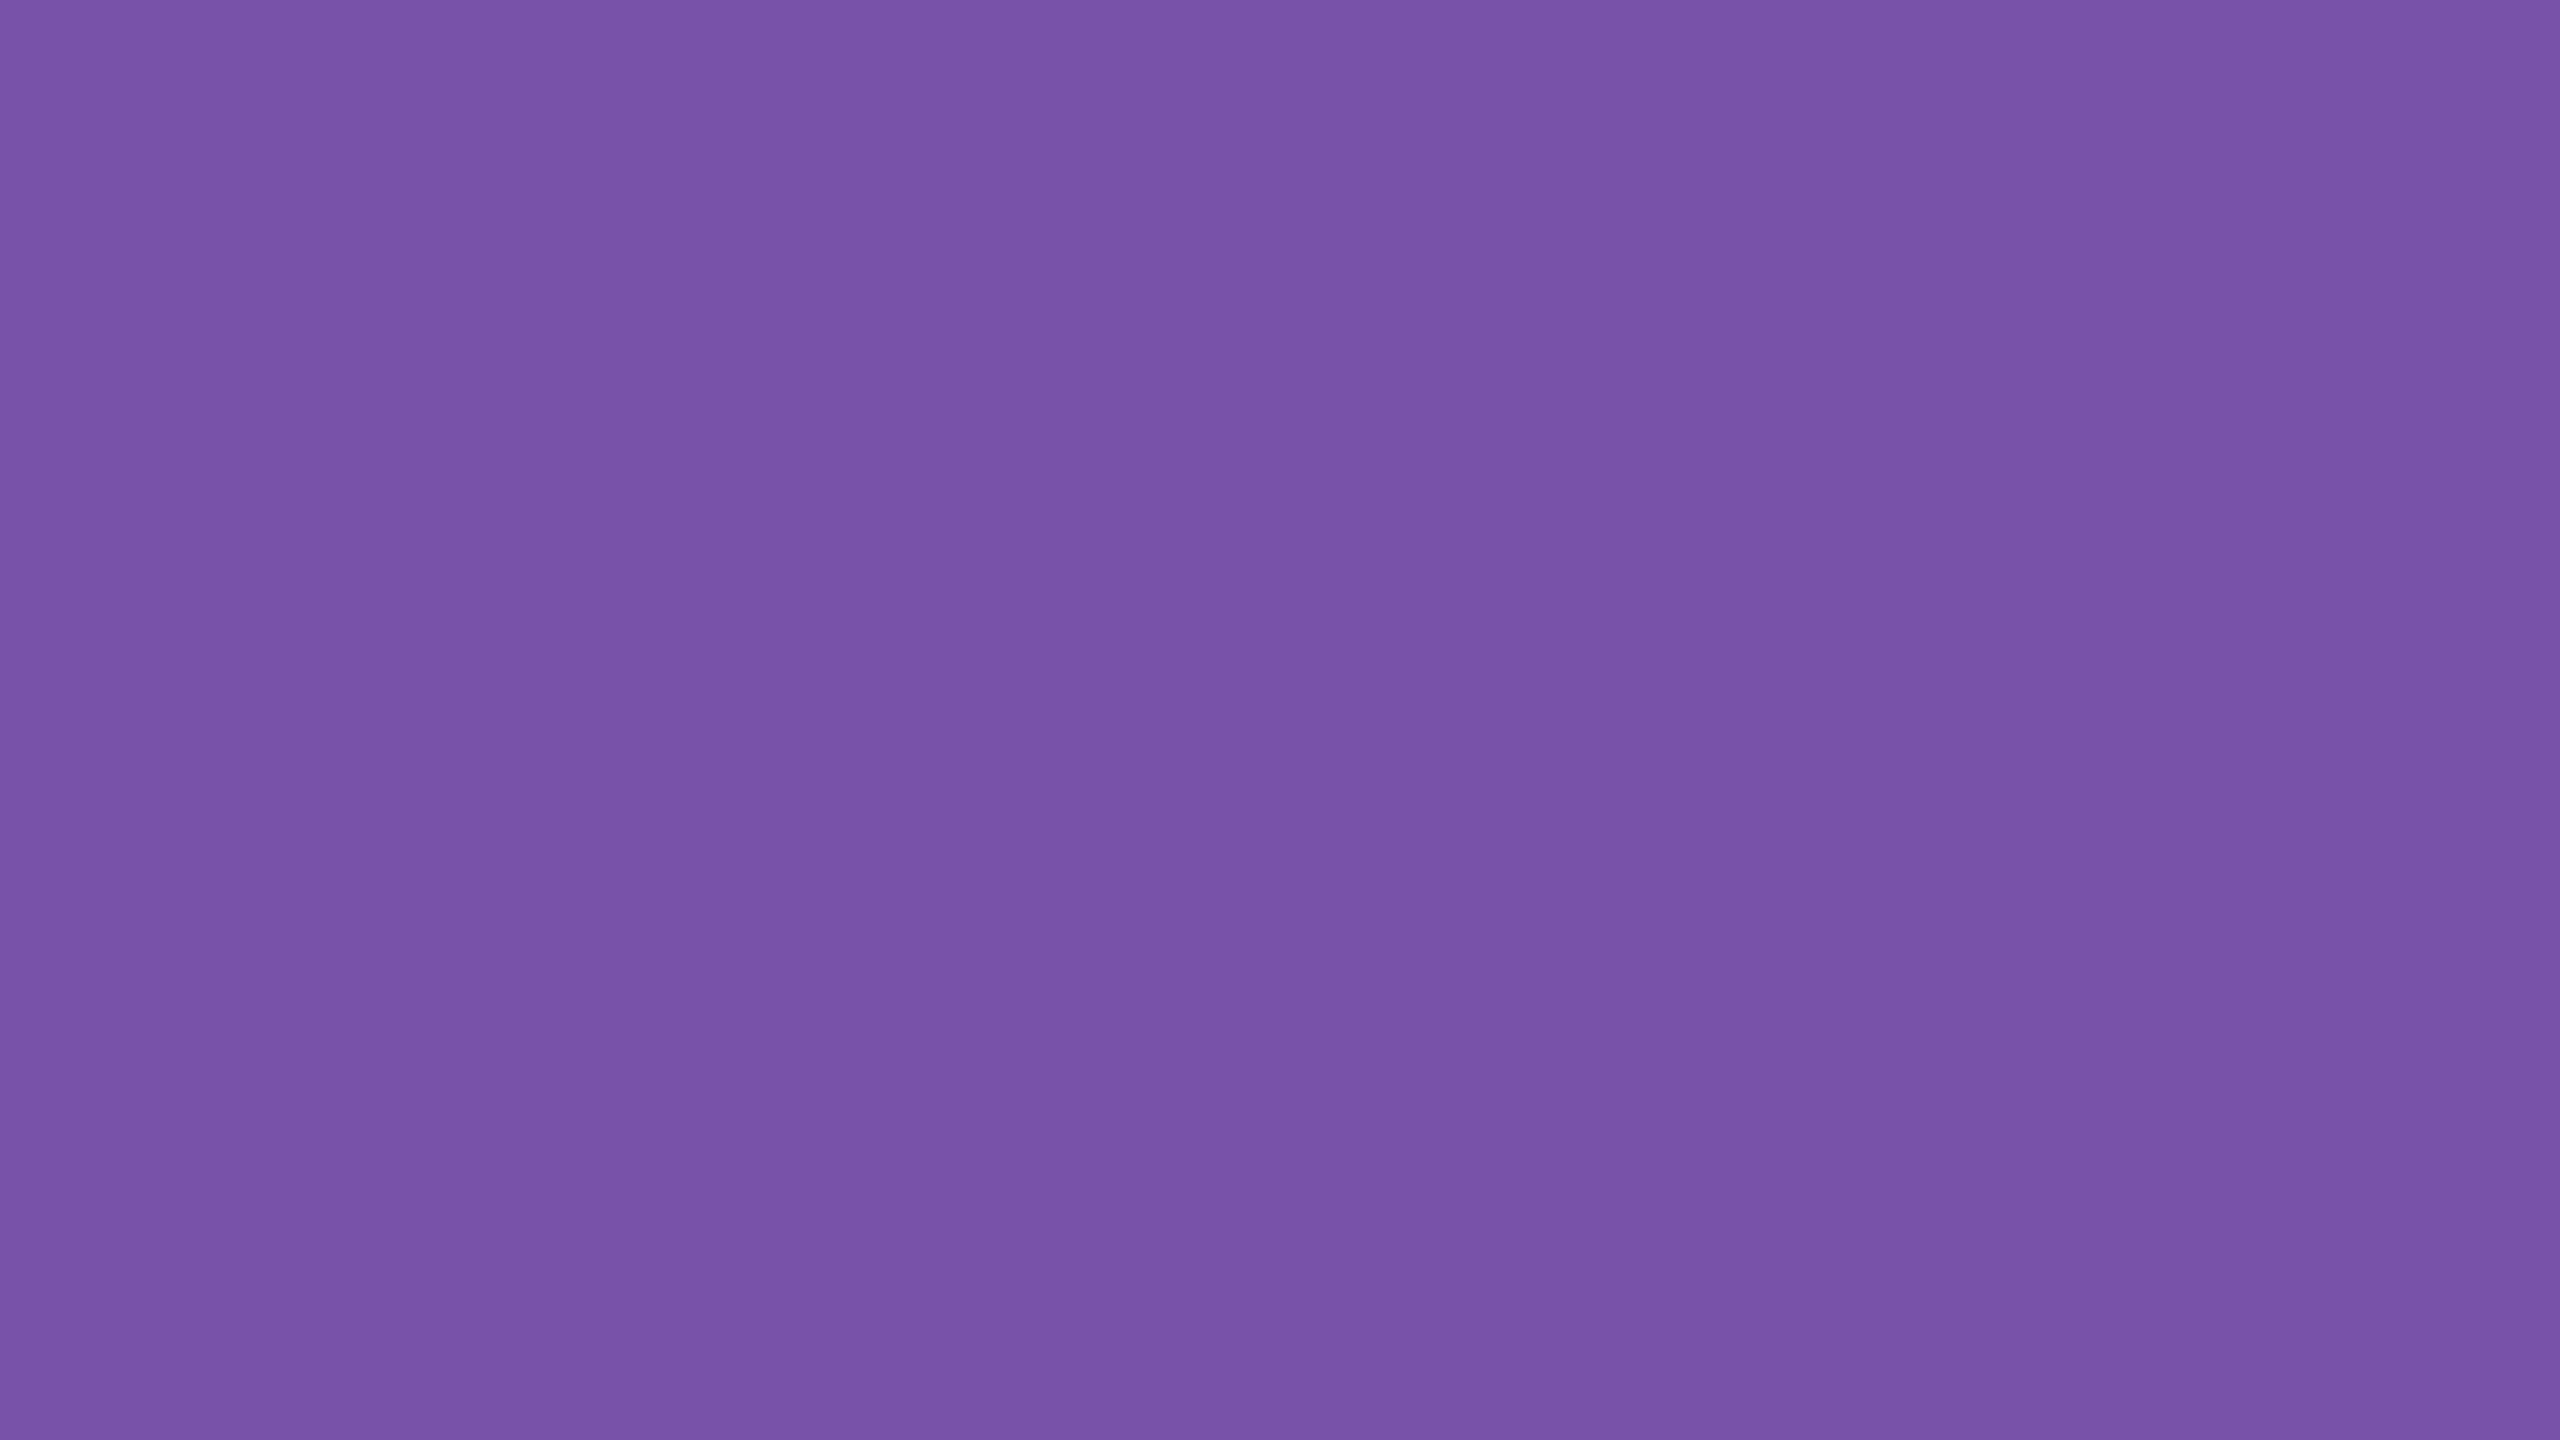 Neon colors purple